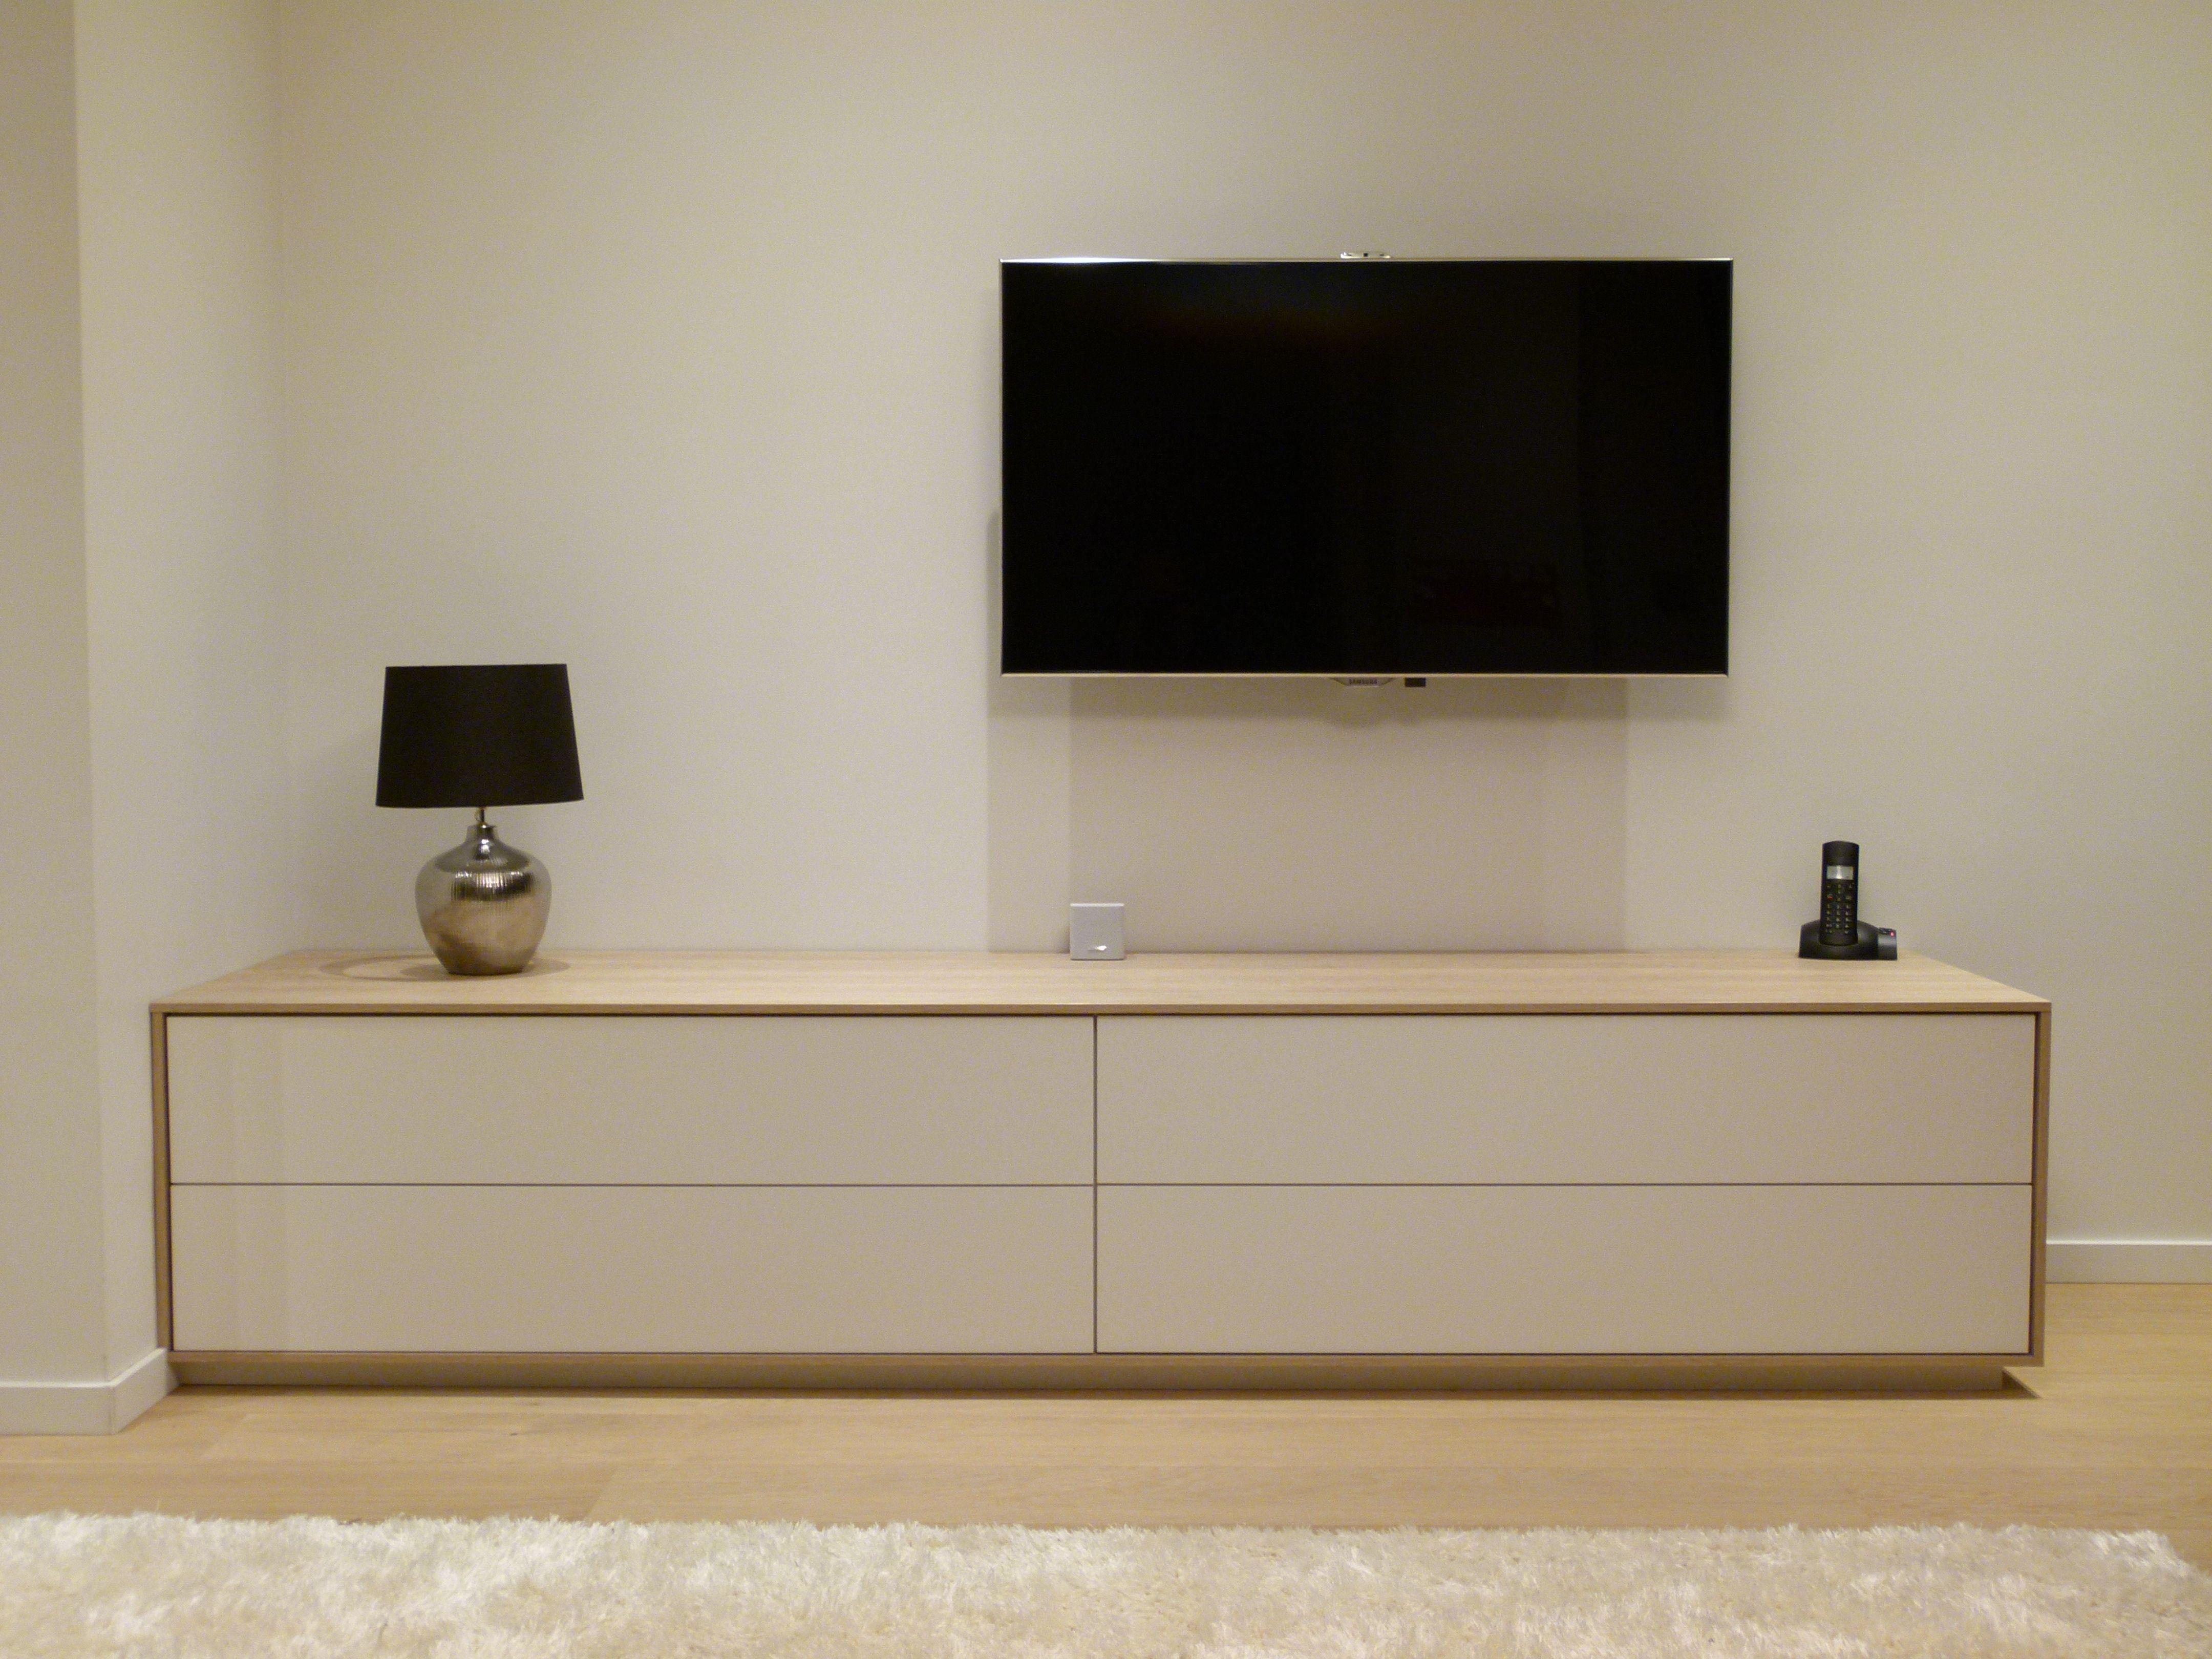 Meuble Tv Design Apparte Perso Pinterest Meuble Tv Tv Et  # Mesure Meuble Tv Expedit